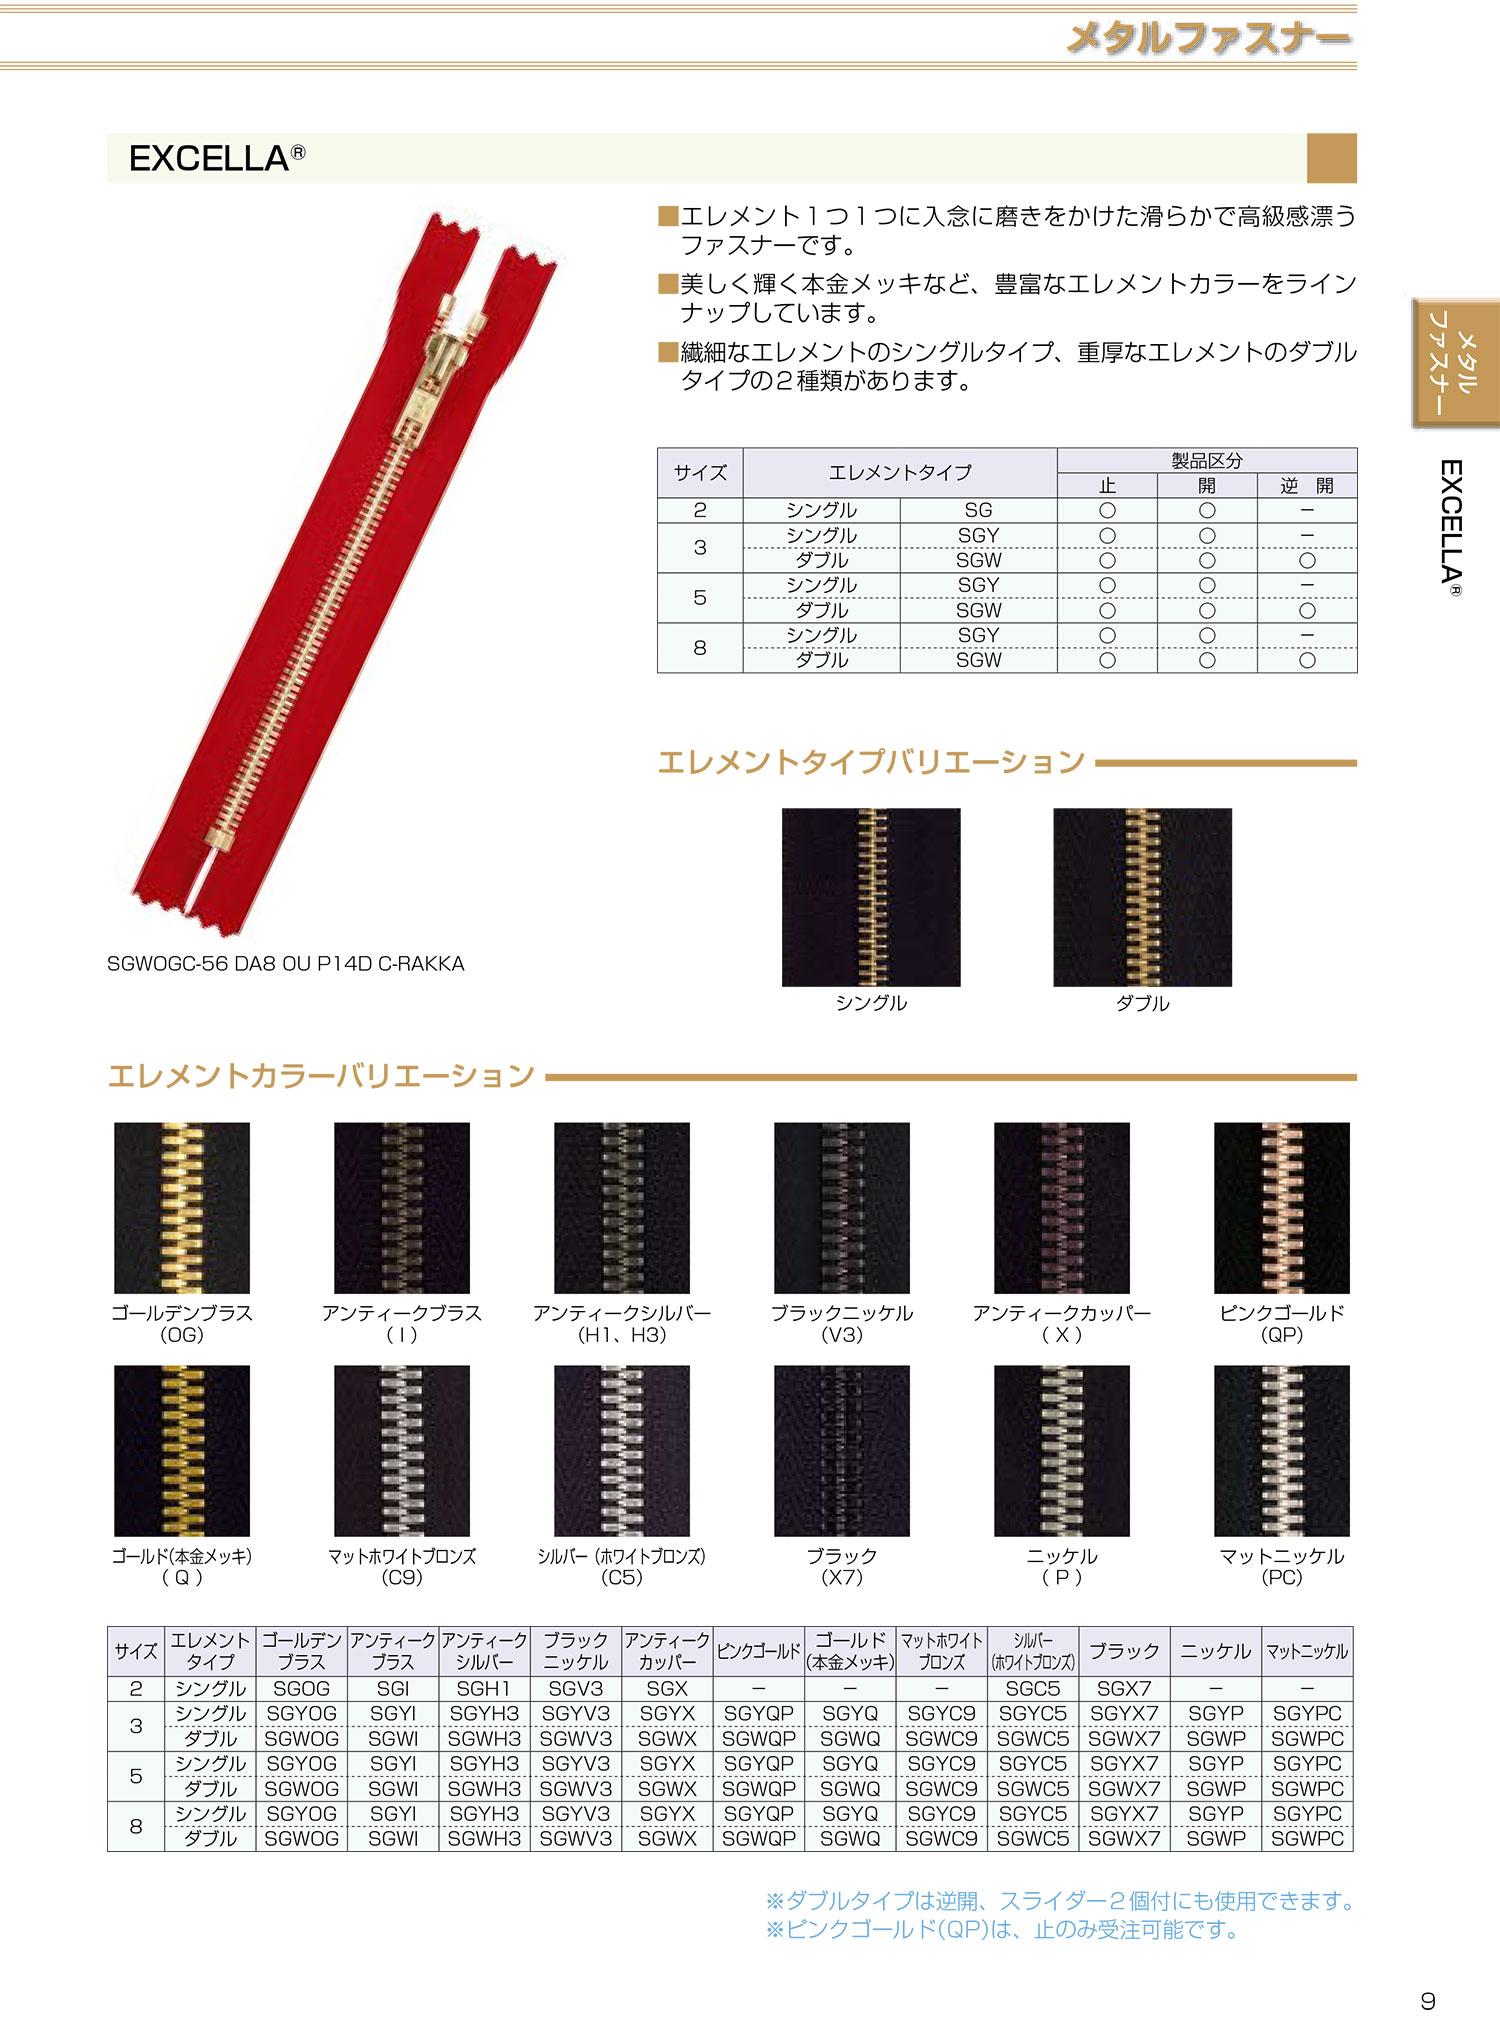 5SGYX7OR エクセラ 5サイズ ブラック オープン シングル[ファスナー] YKK/オークラ商事 - ApparelX アパレル資材卸通販